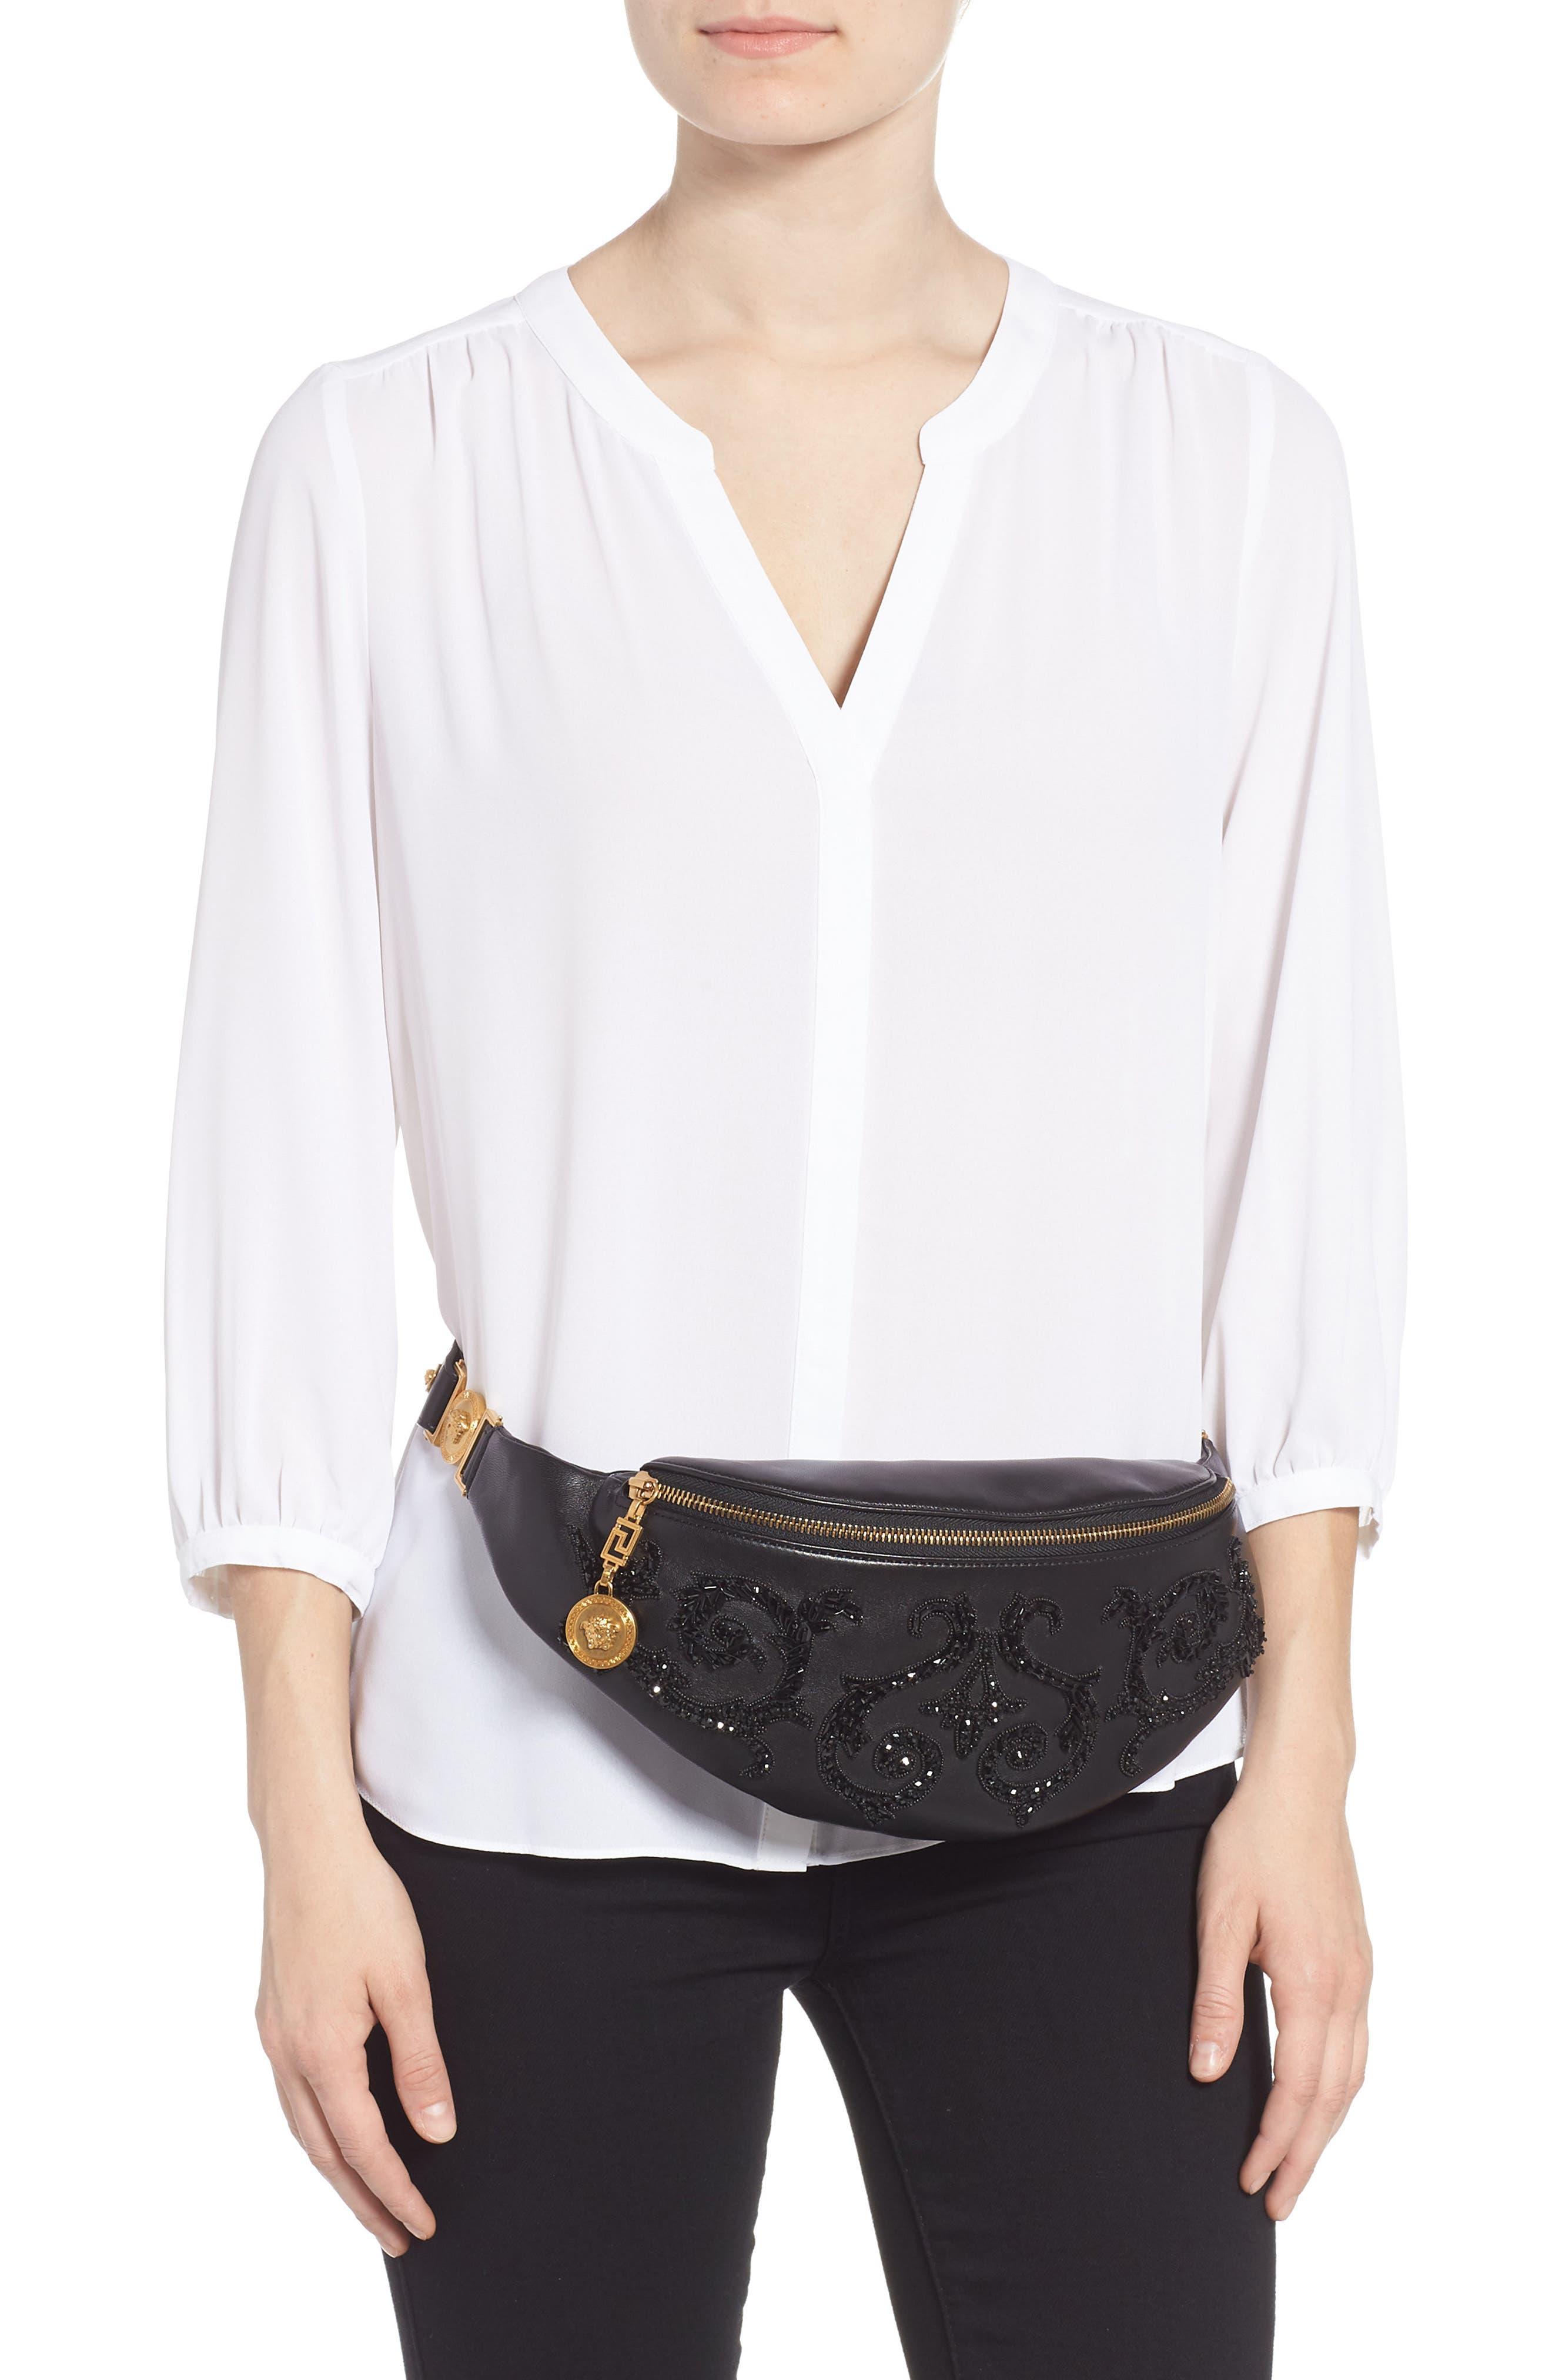 VERSACE COLLECTION,                             Versace Crystal Embellished Leather Belt Bag,                             Alternate thumbnail 2, color,                             NERO